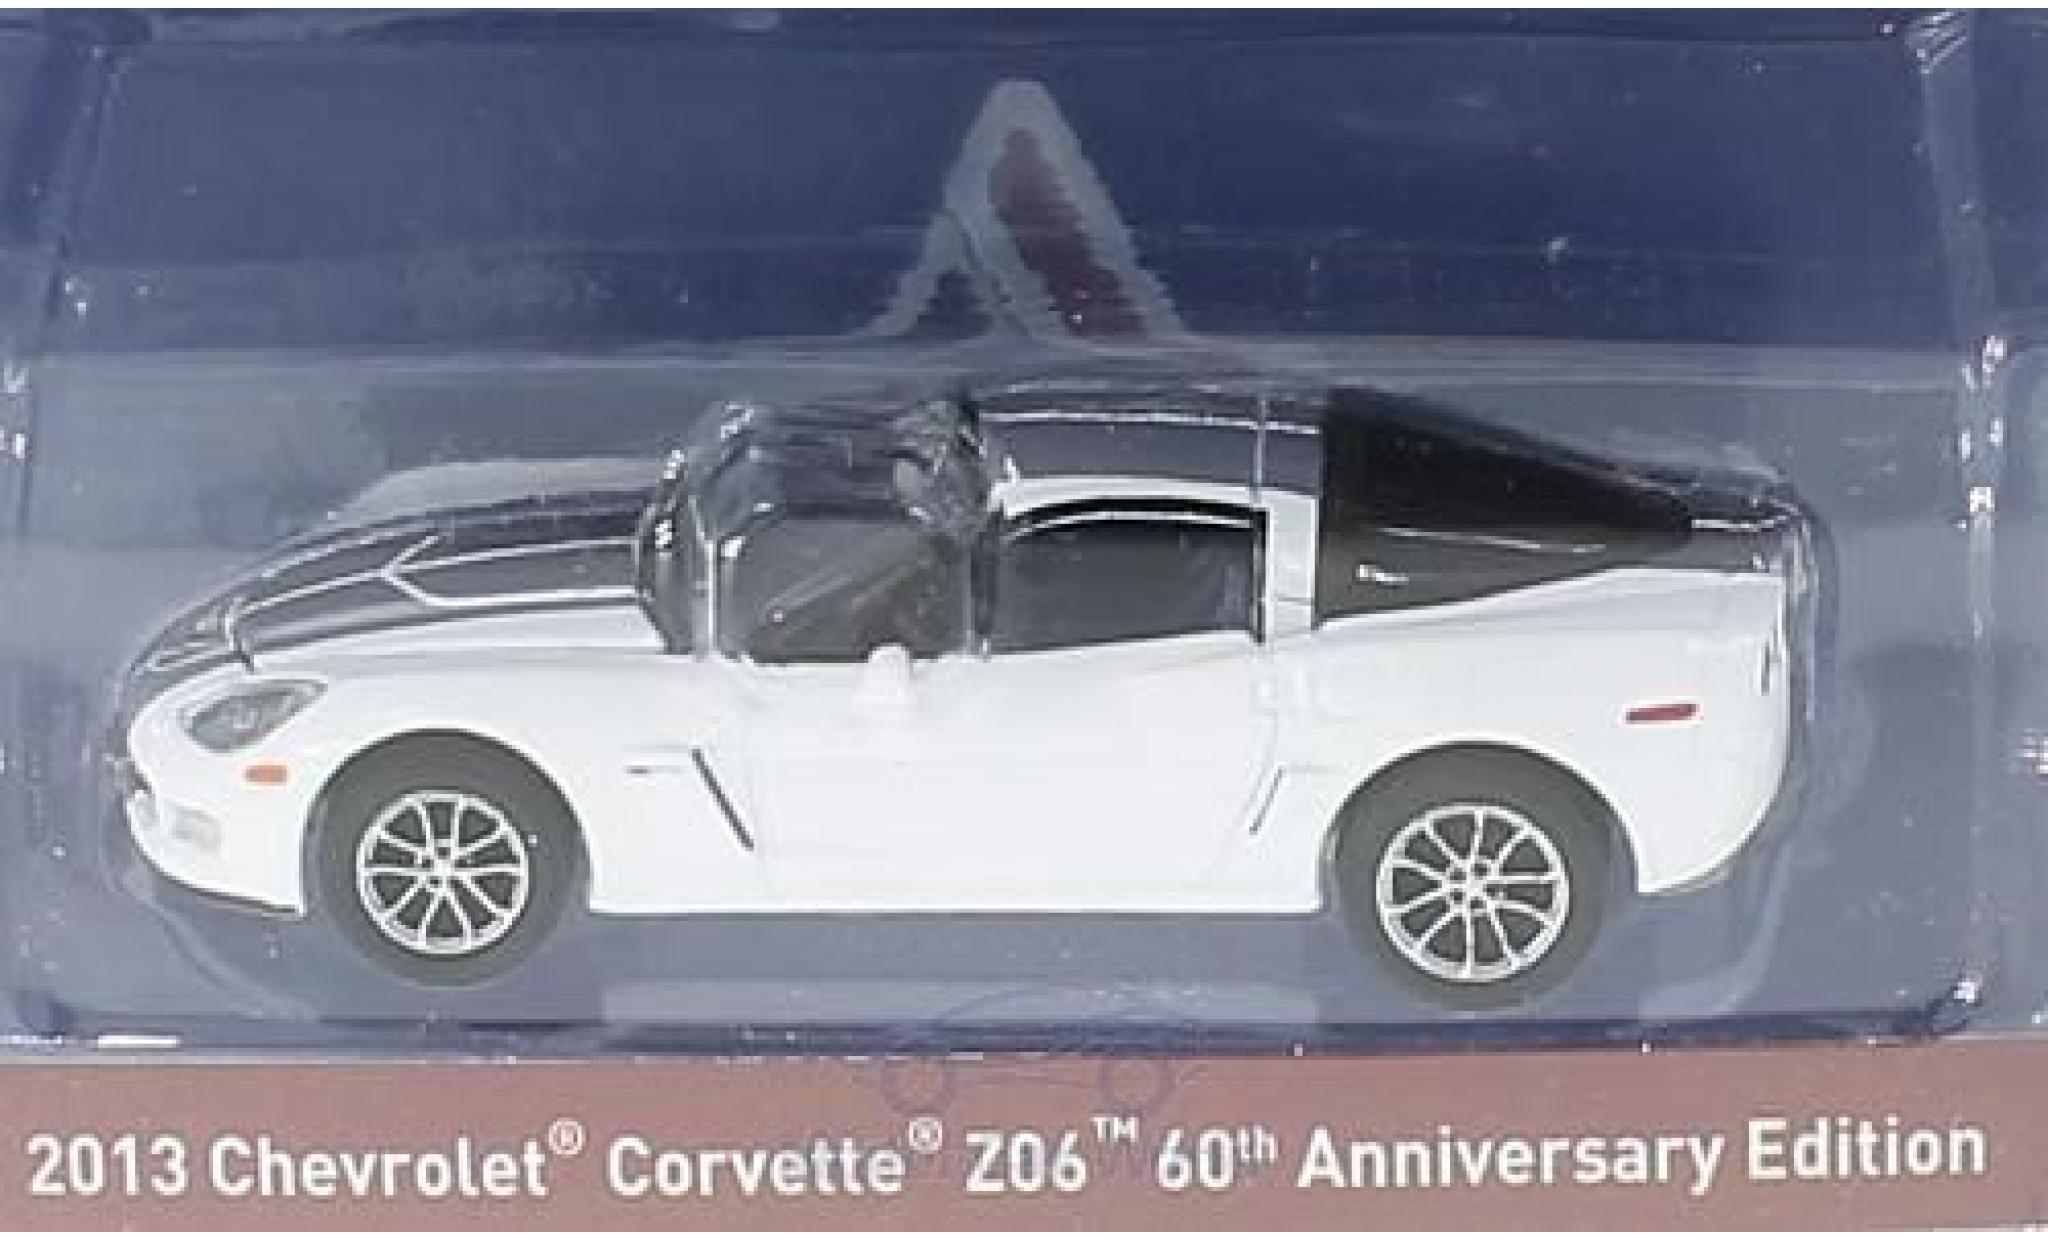 Chevrolet Corvette C6 1/64 Greenlight white/grey 2013 60th Anniversary Edition